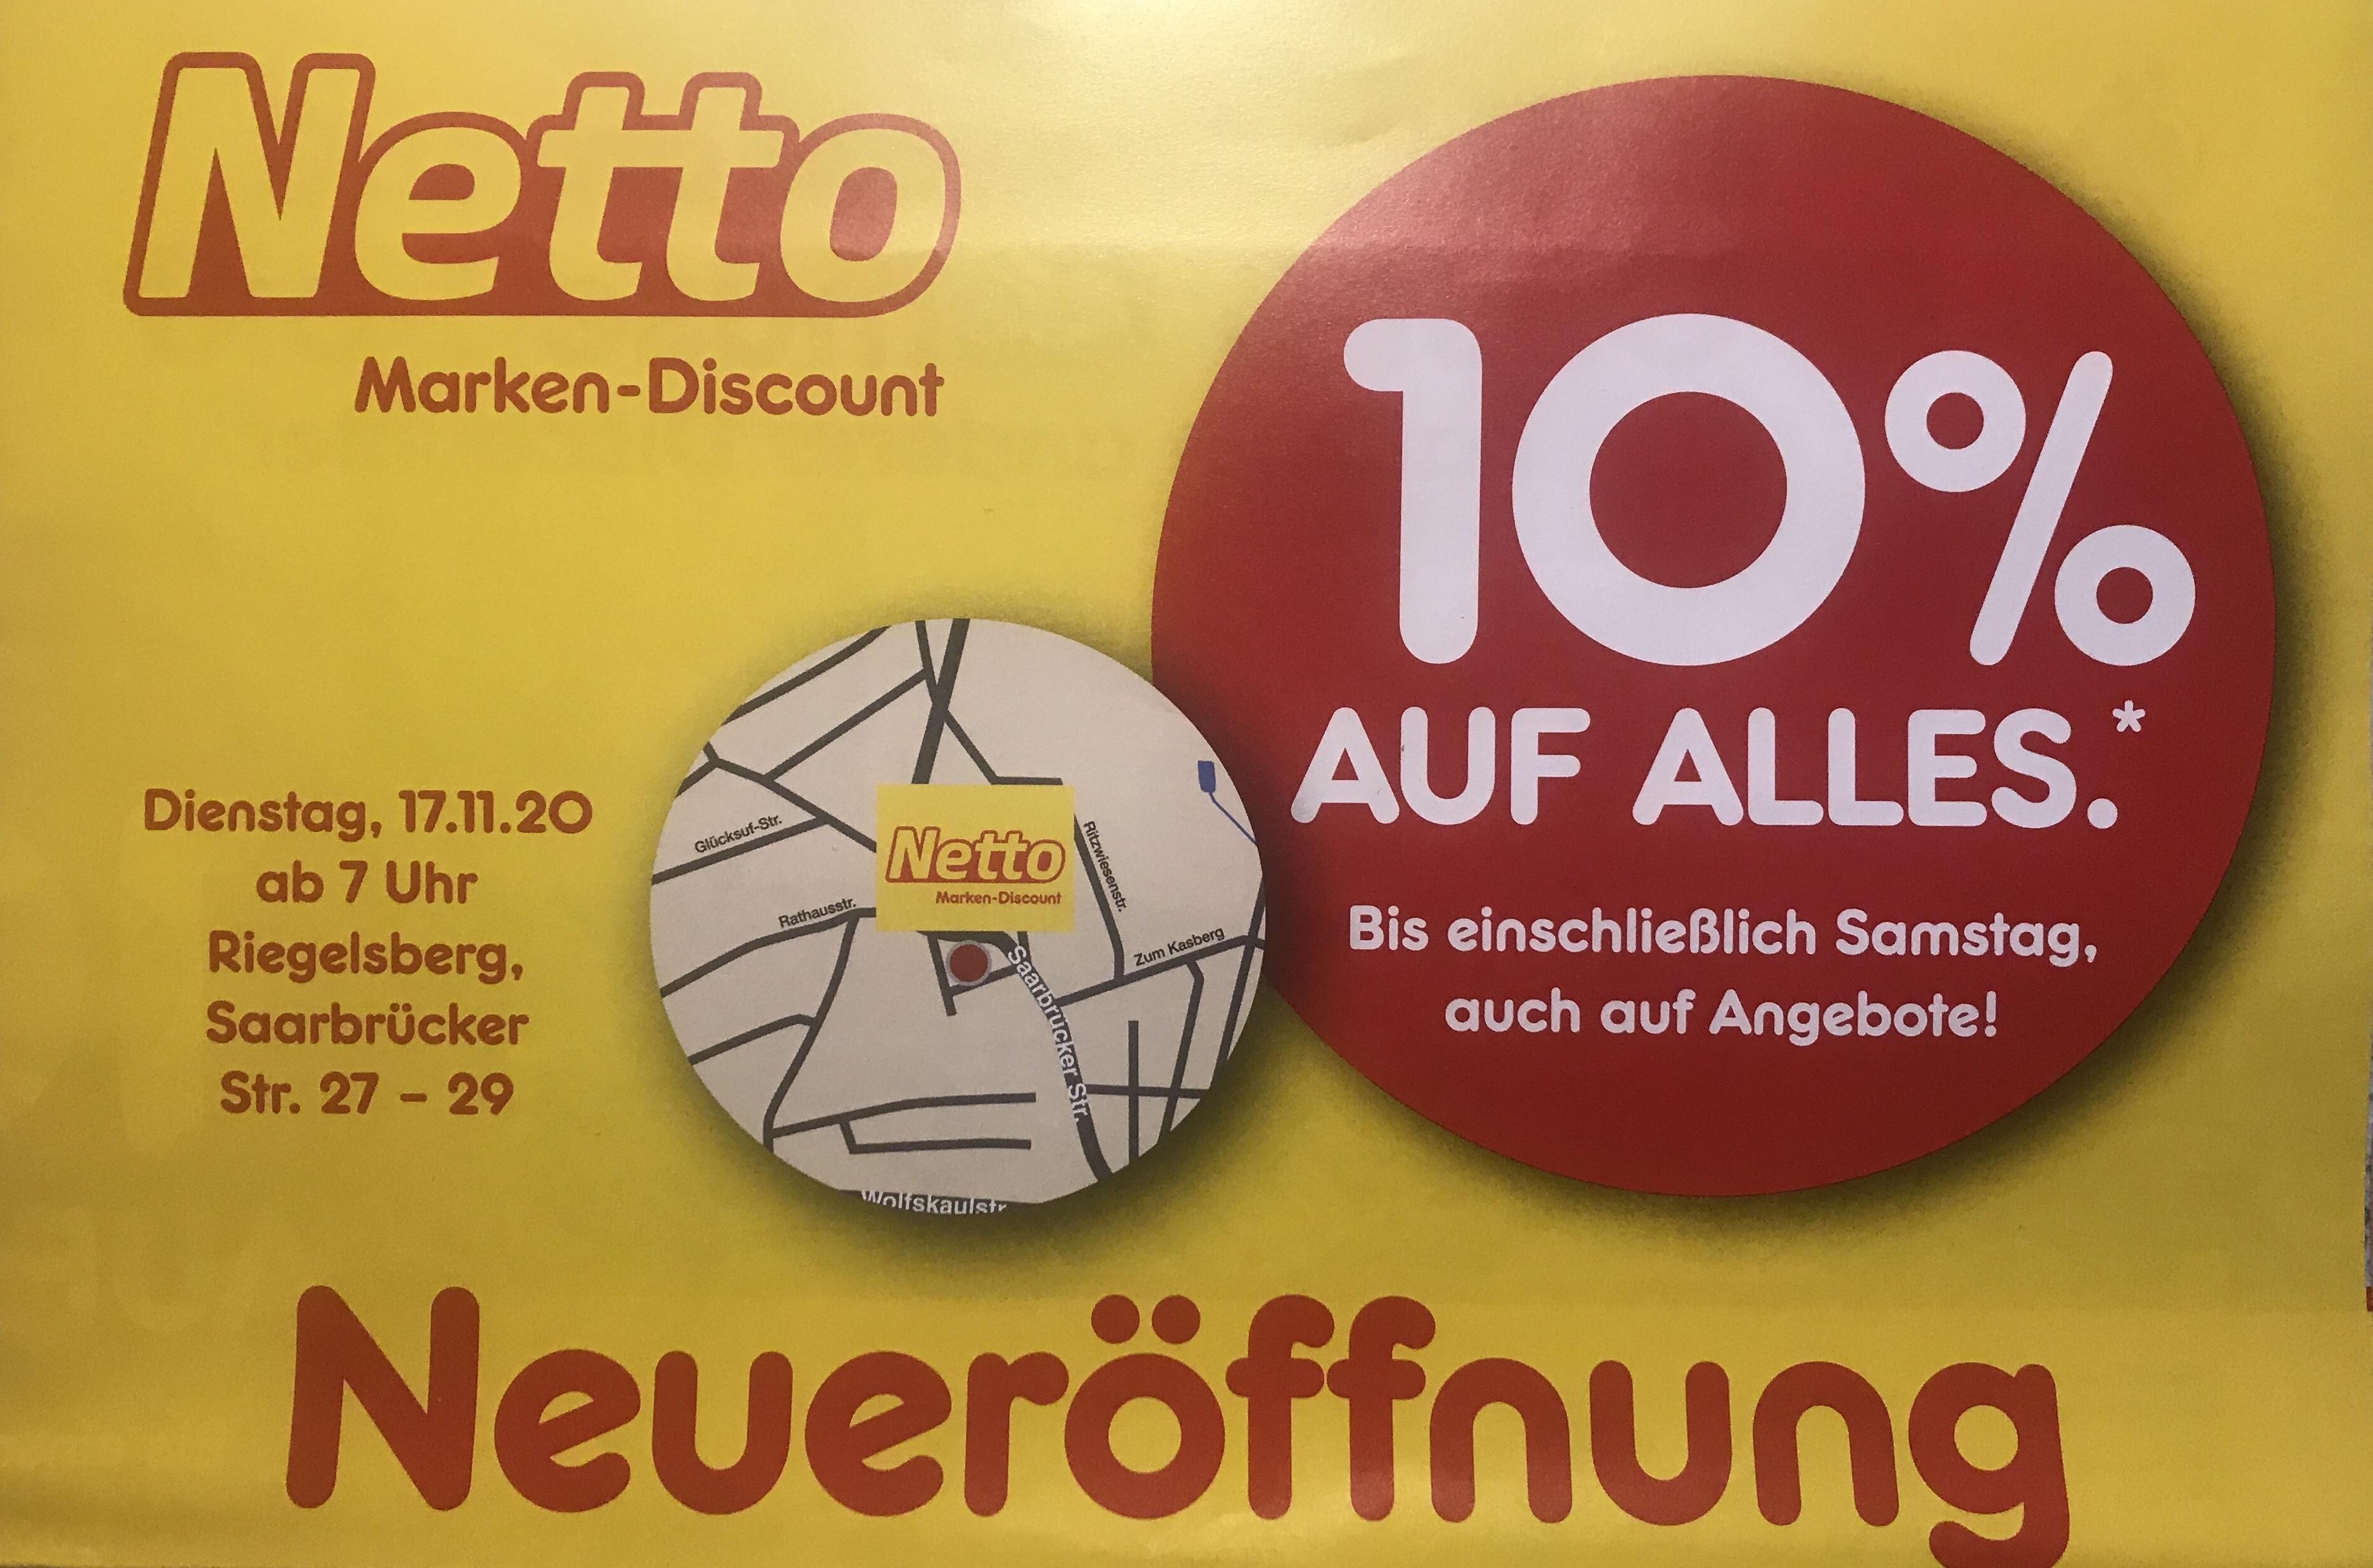 [Lokal] Netto Riegelsberg 10% auf alles